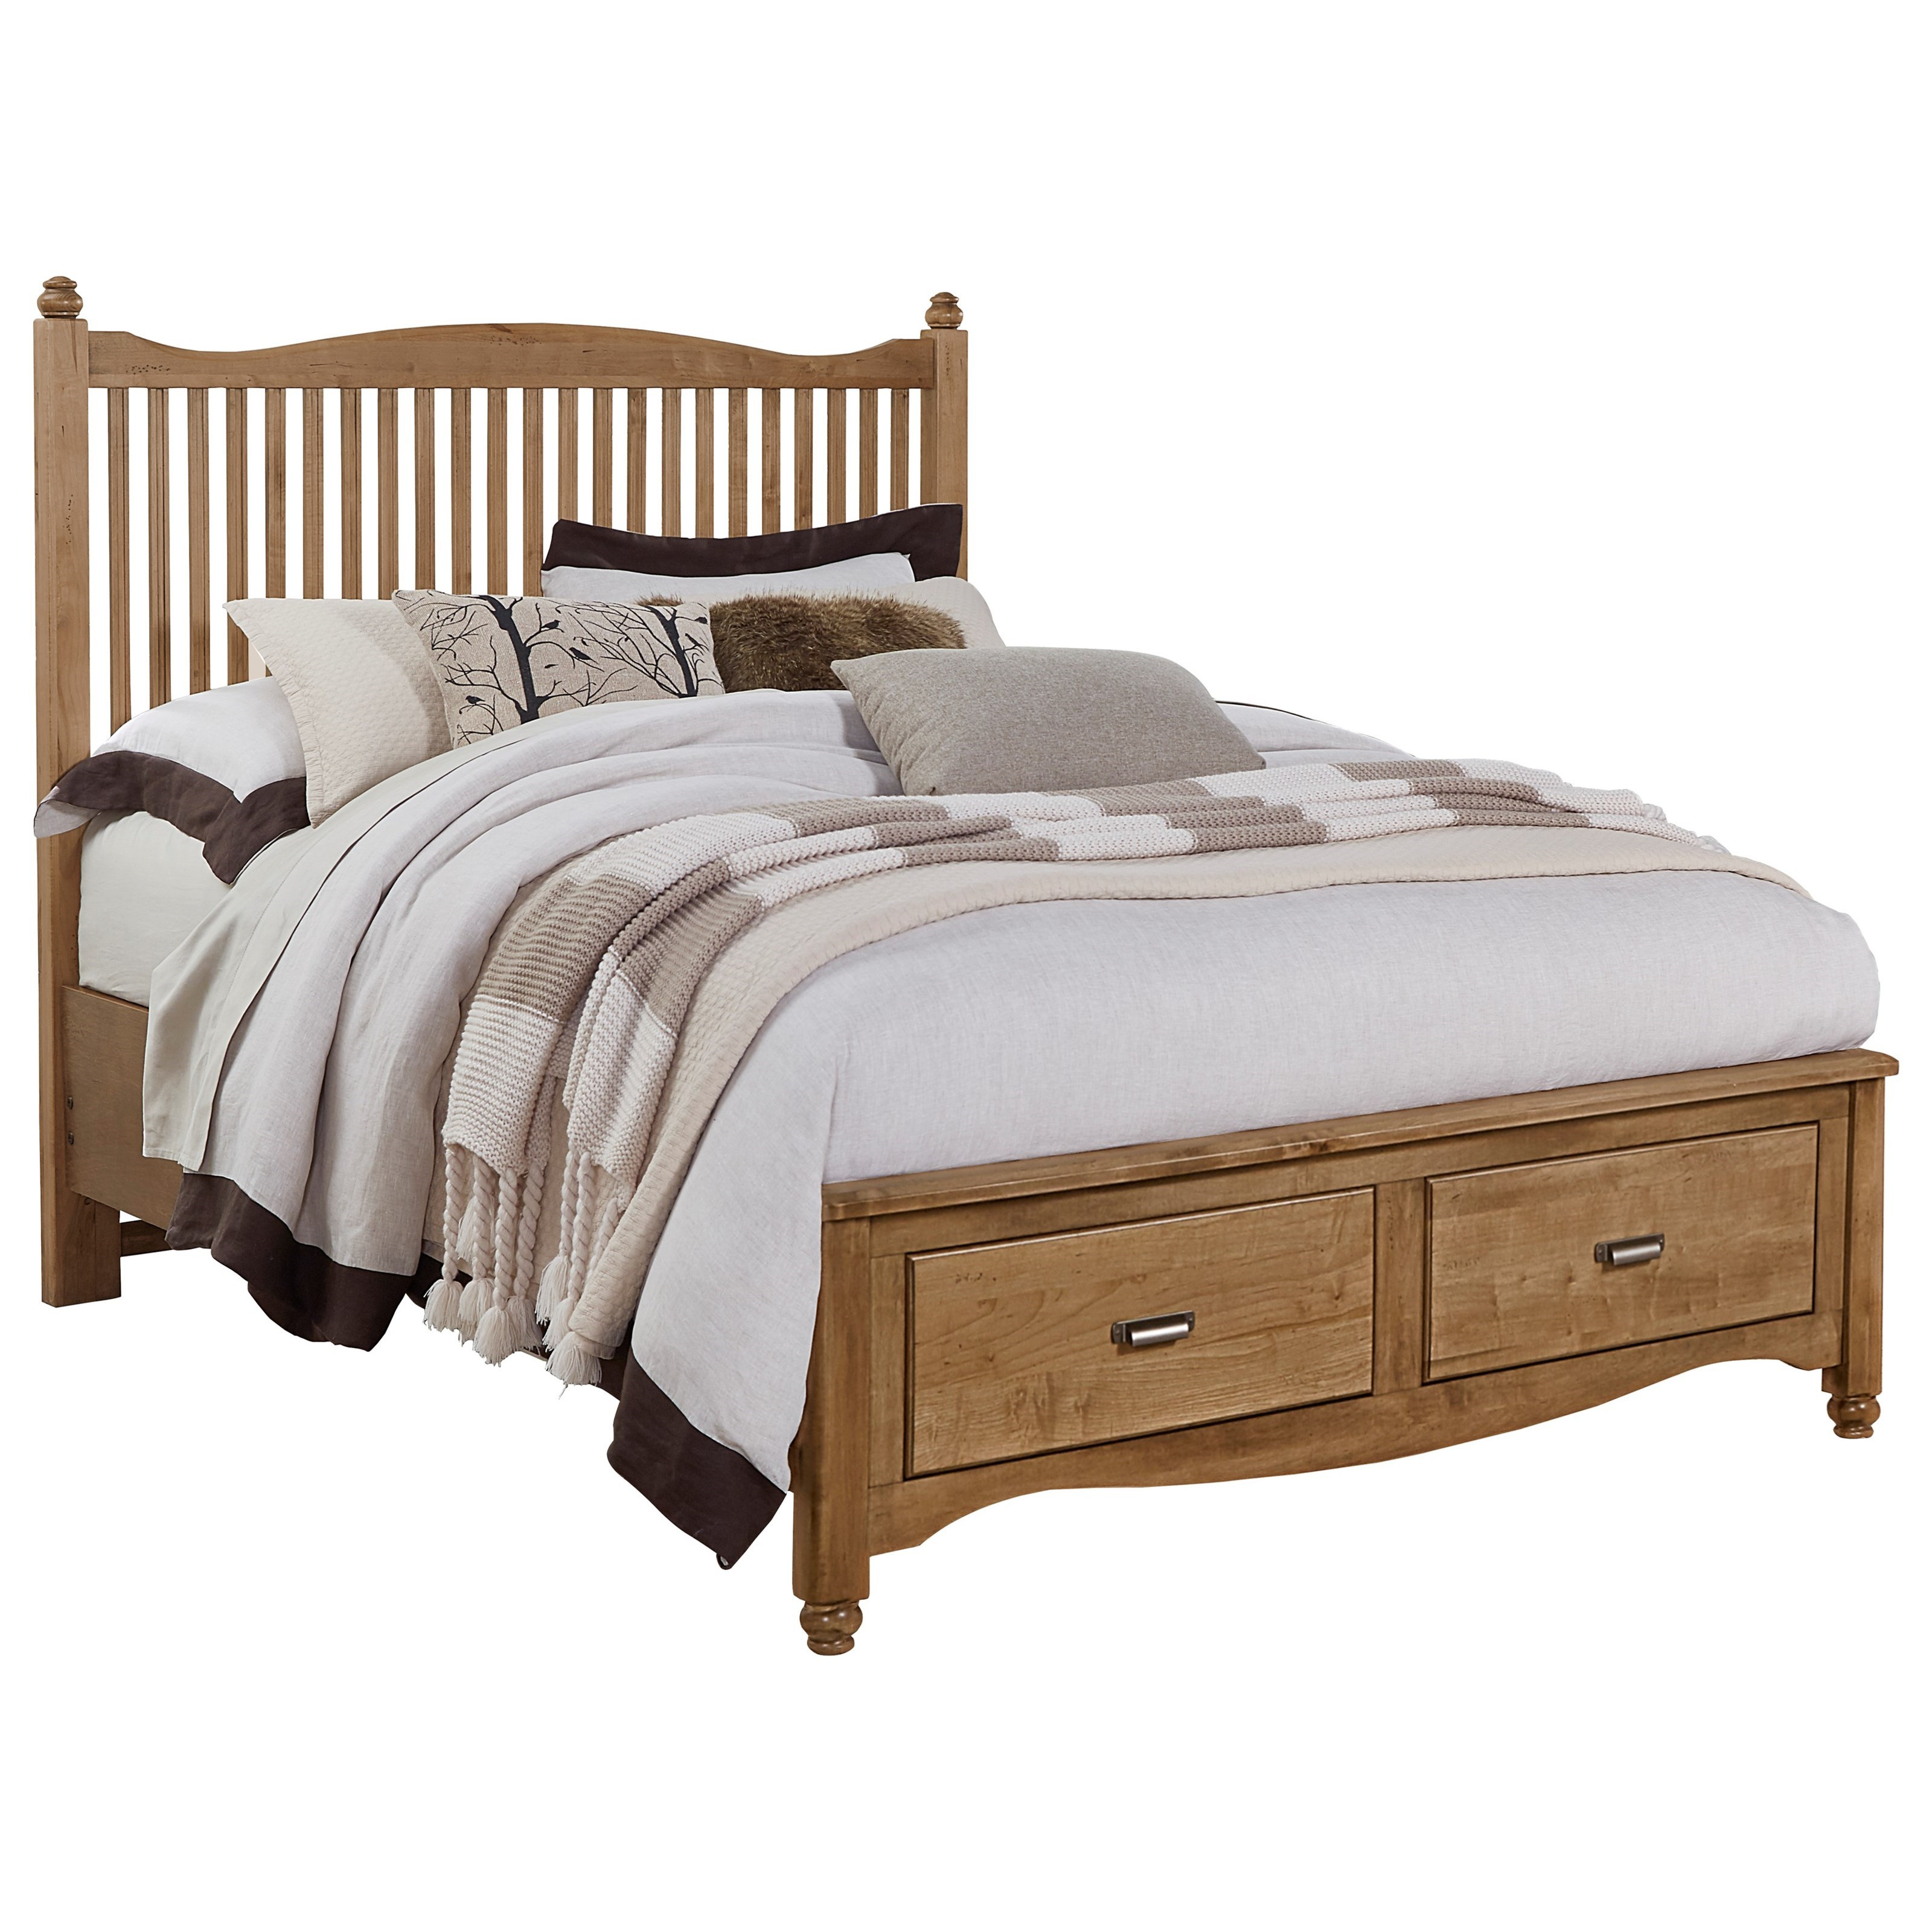 Vaughan Bassett American Maple Queen Slat Storage Bed - Item Number: 402-557+050B+502+555T